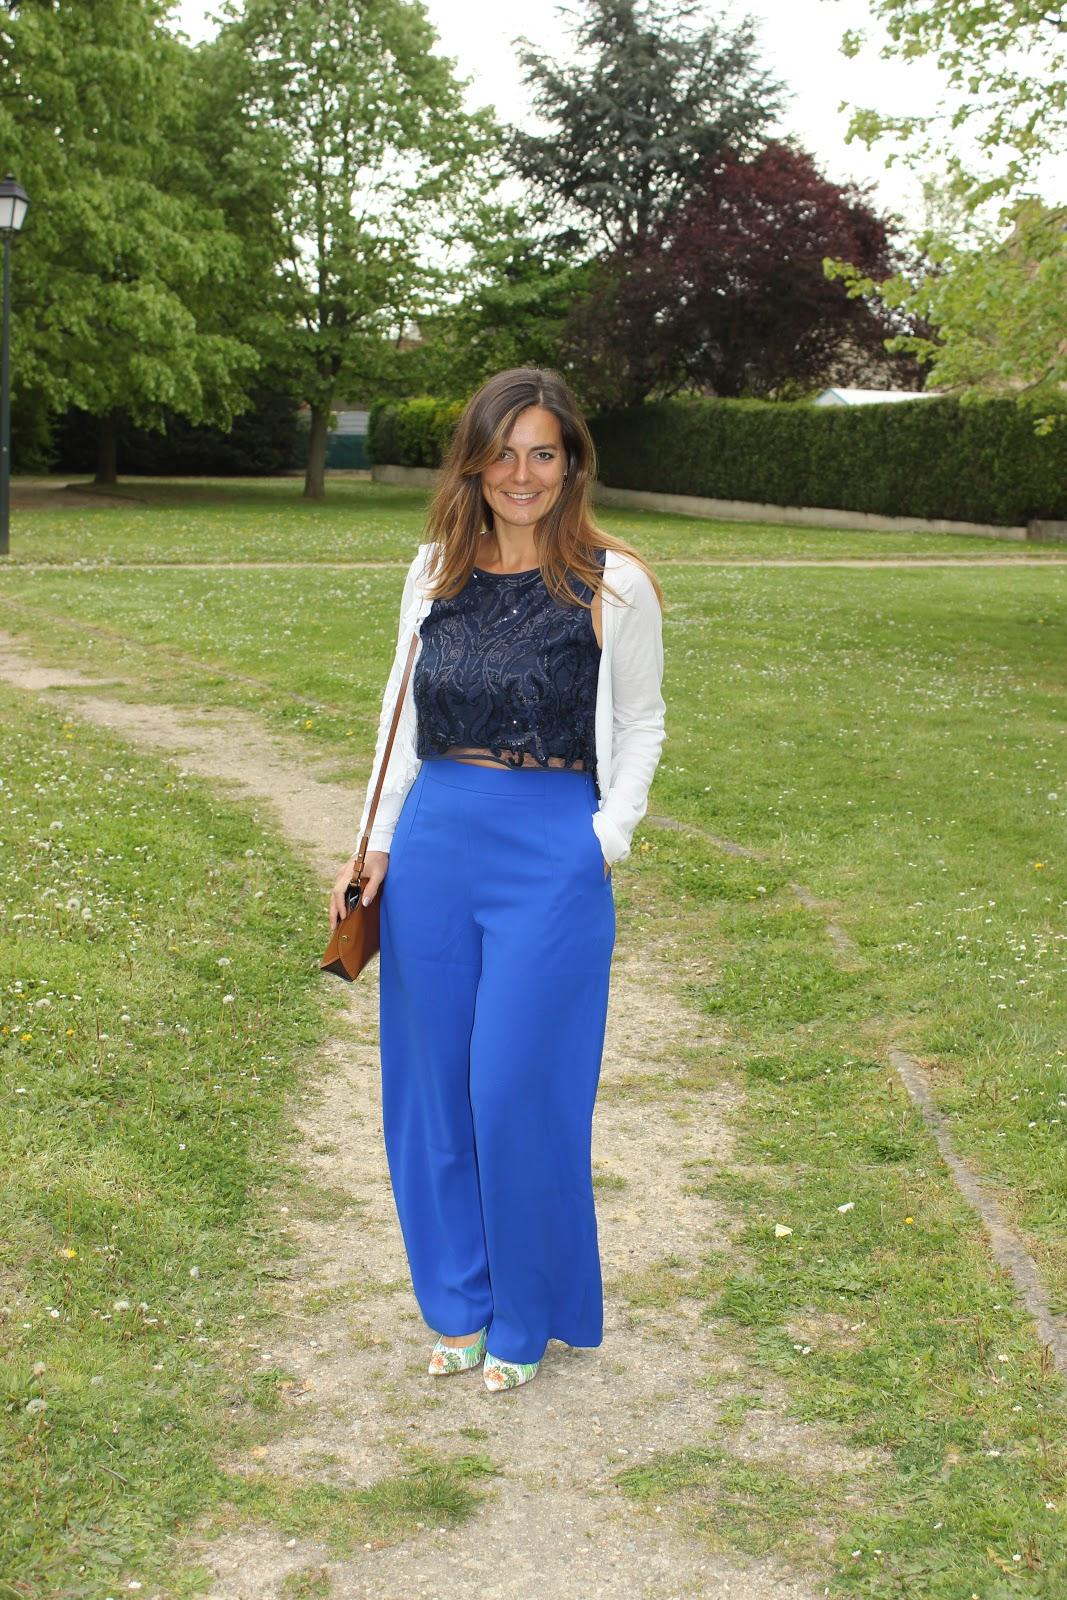 pantalon suncoo large bleu, top zara, les petites bulles de ma vie